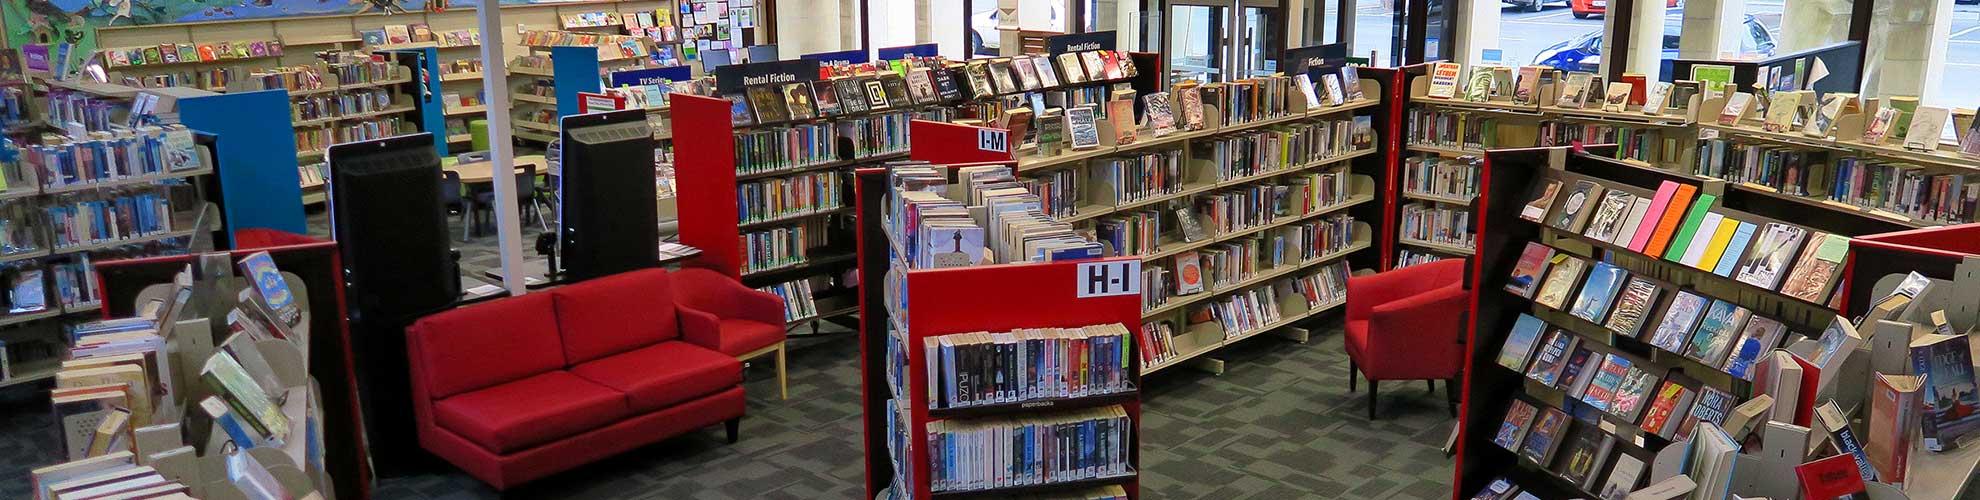 Oamaru Library